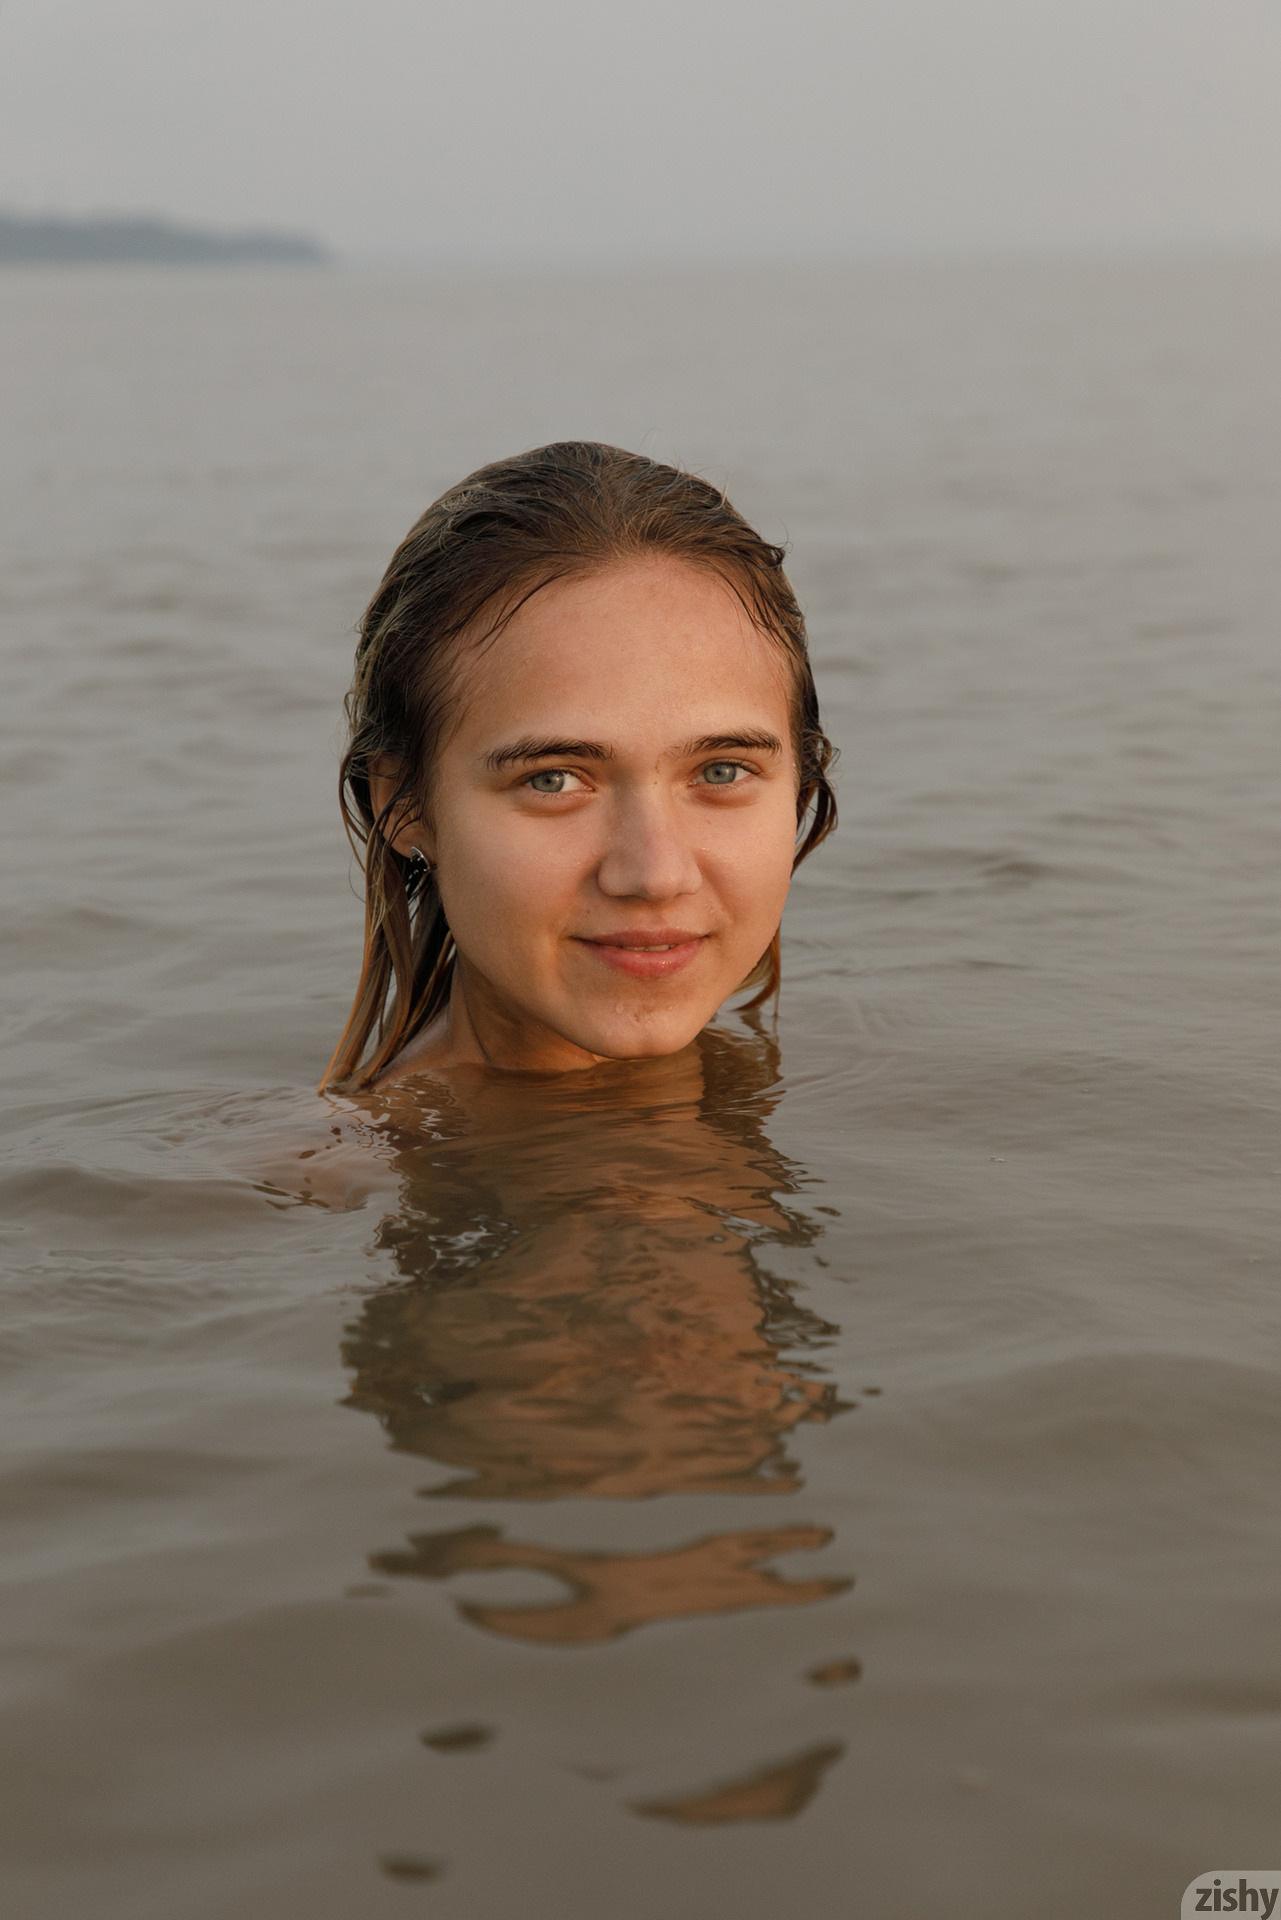 Sofia Orlova On Gryaznyy Beach Zishy (83)